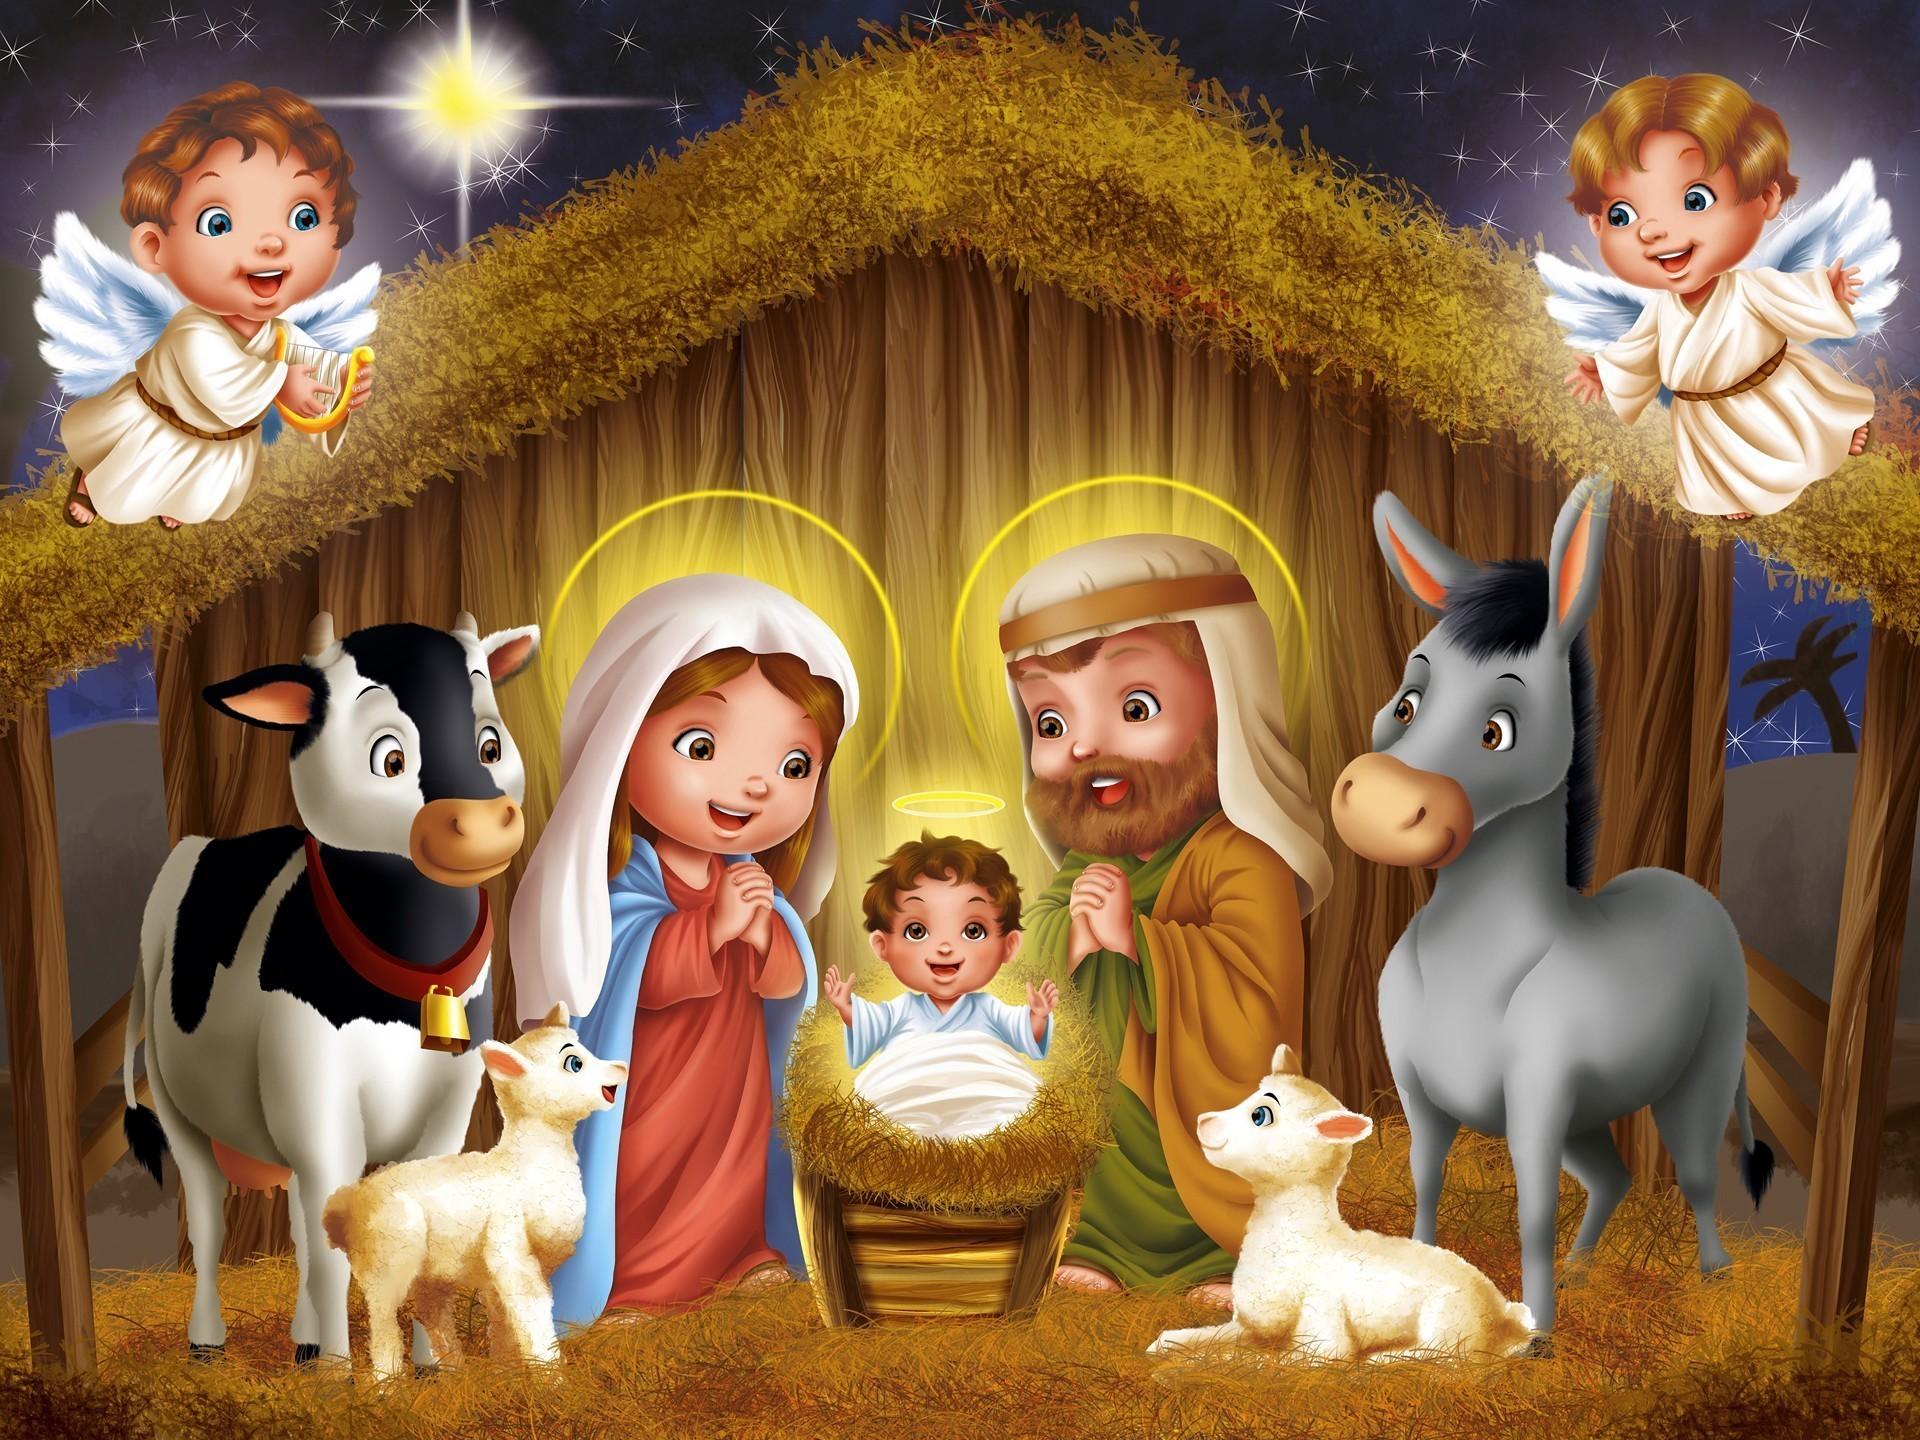 Fondos De Navidad Bonitos Para Pantalla Hd 2 HD Wallpapers